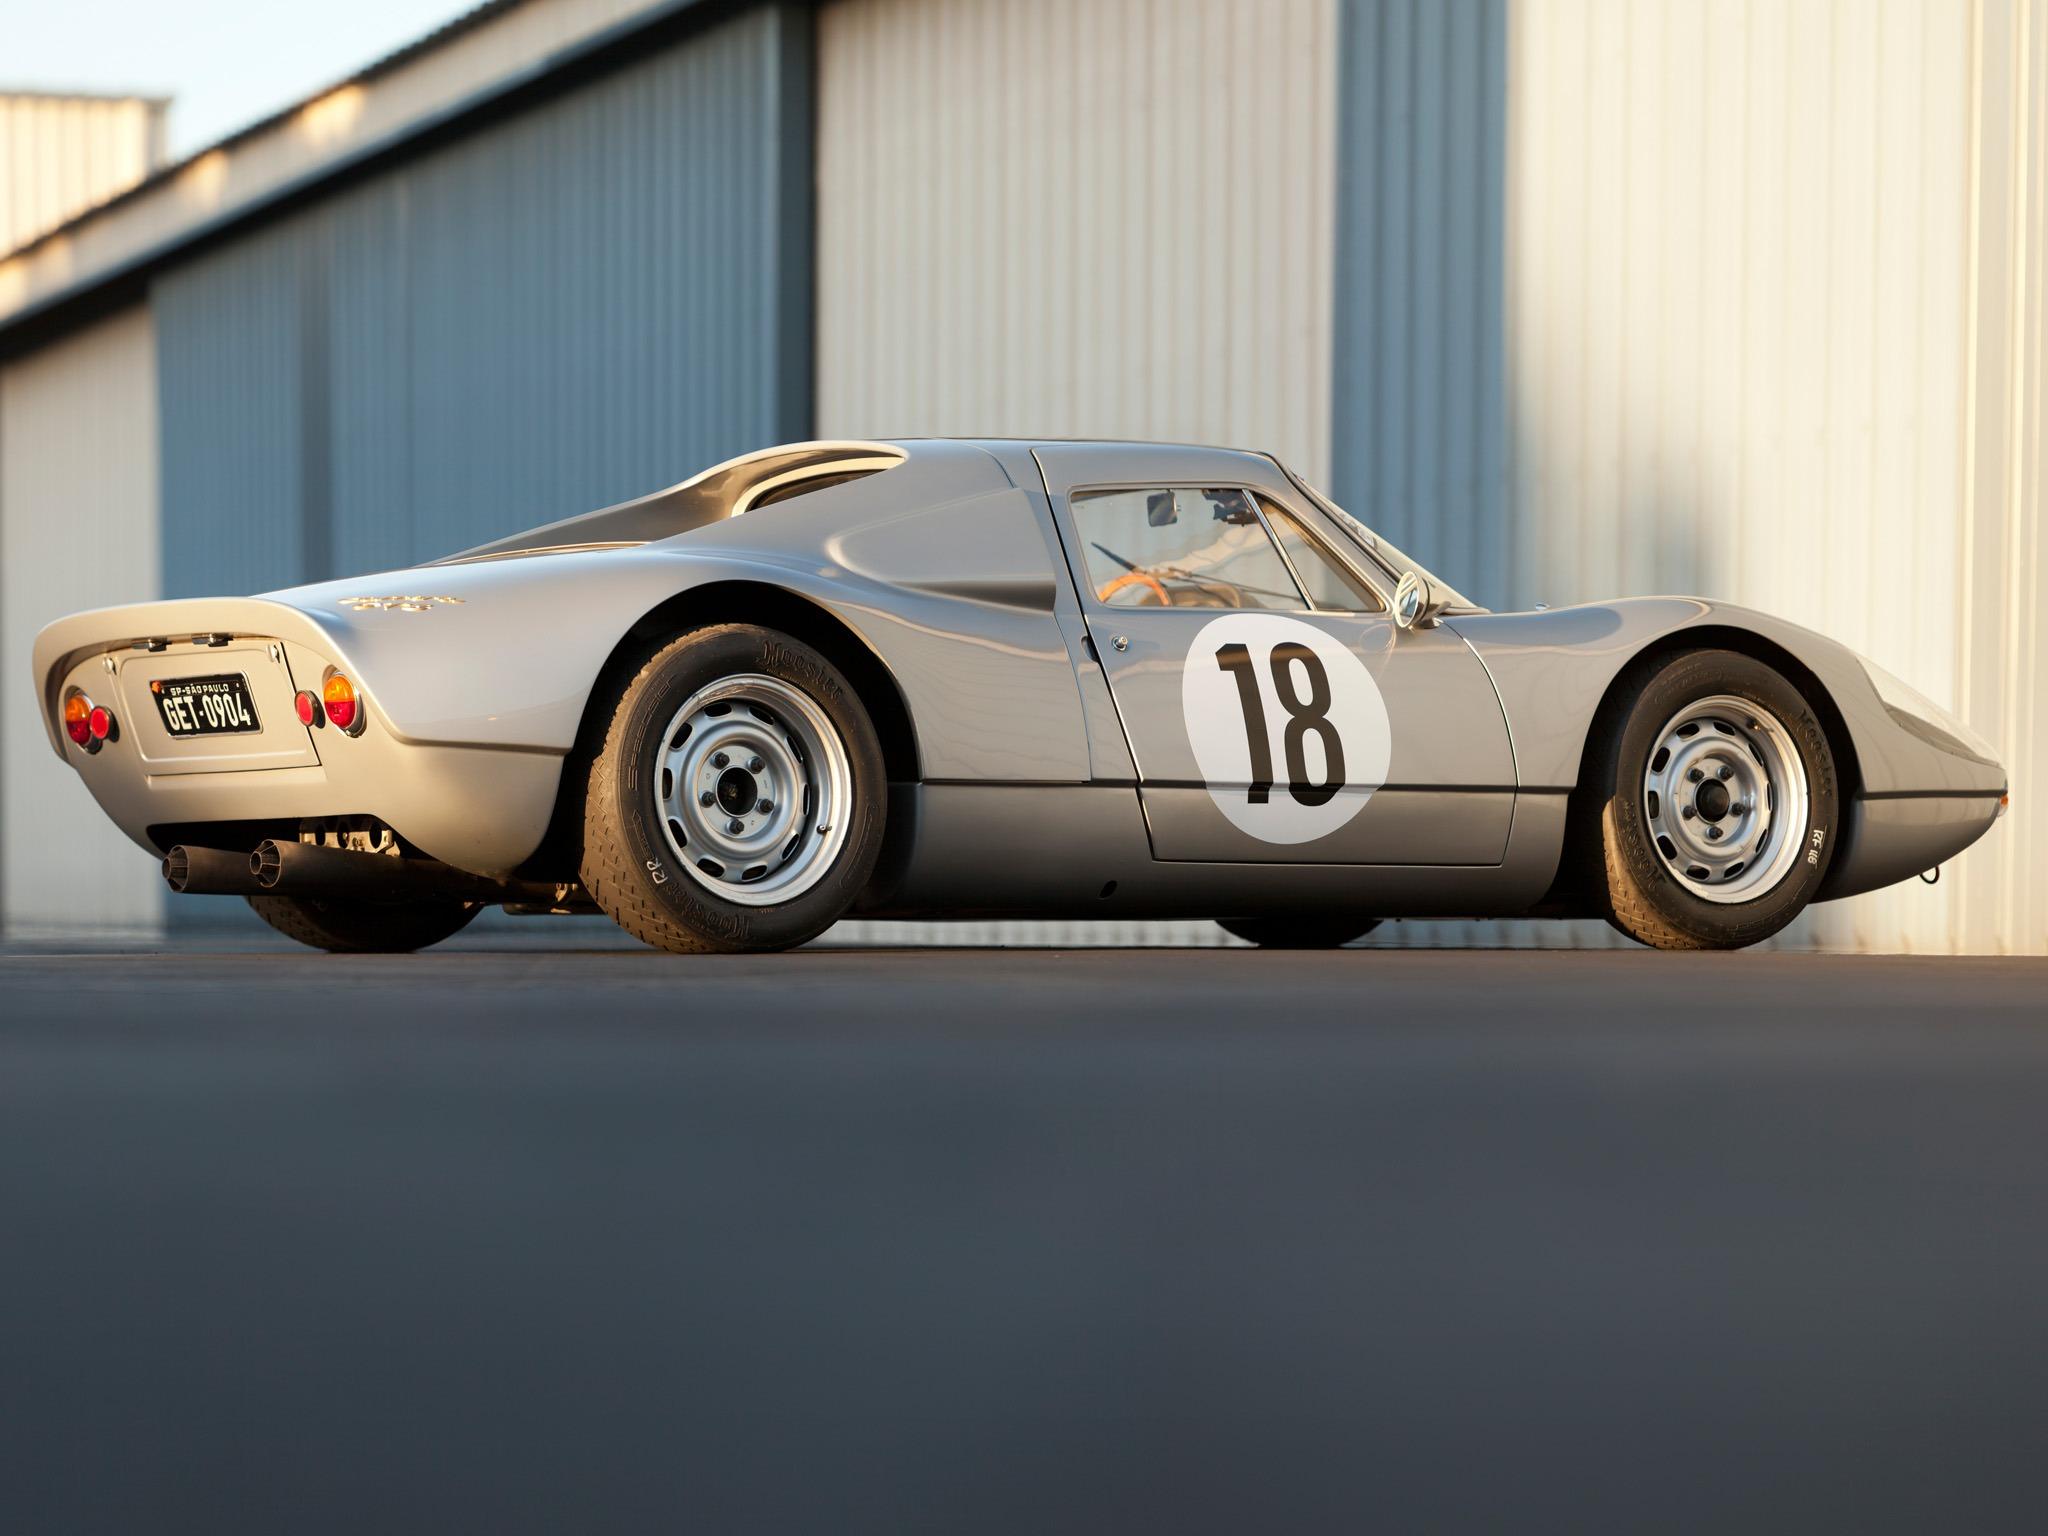 Porsche 904/6 Carrera GTS Prototype (1963) – Old Concept Cars